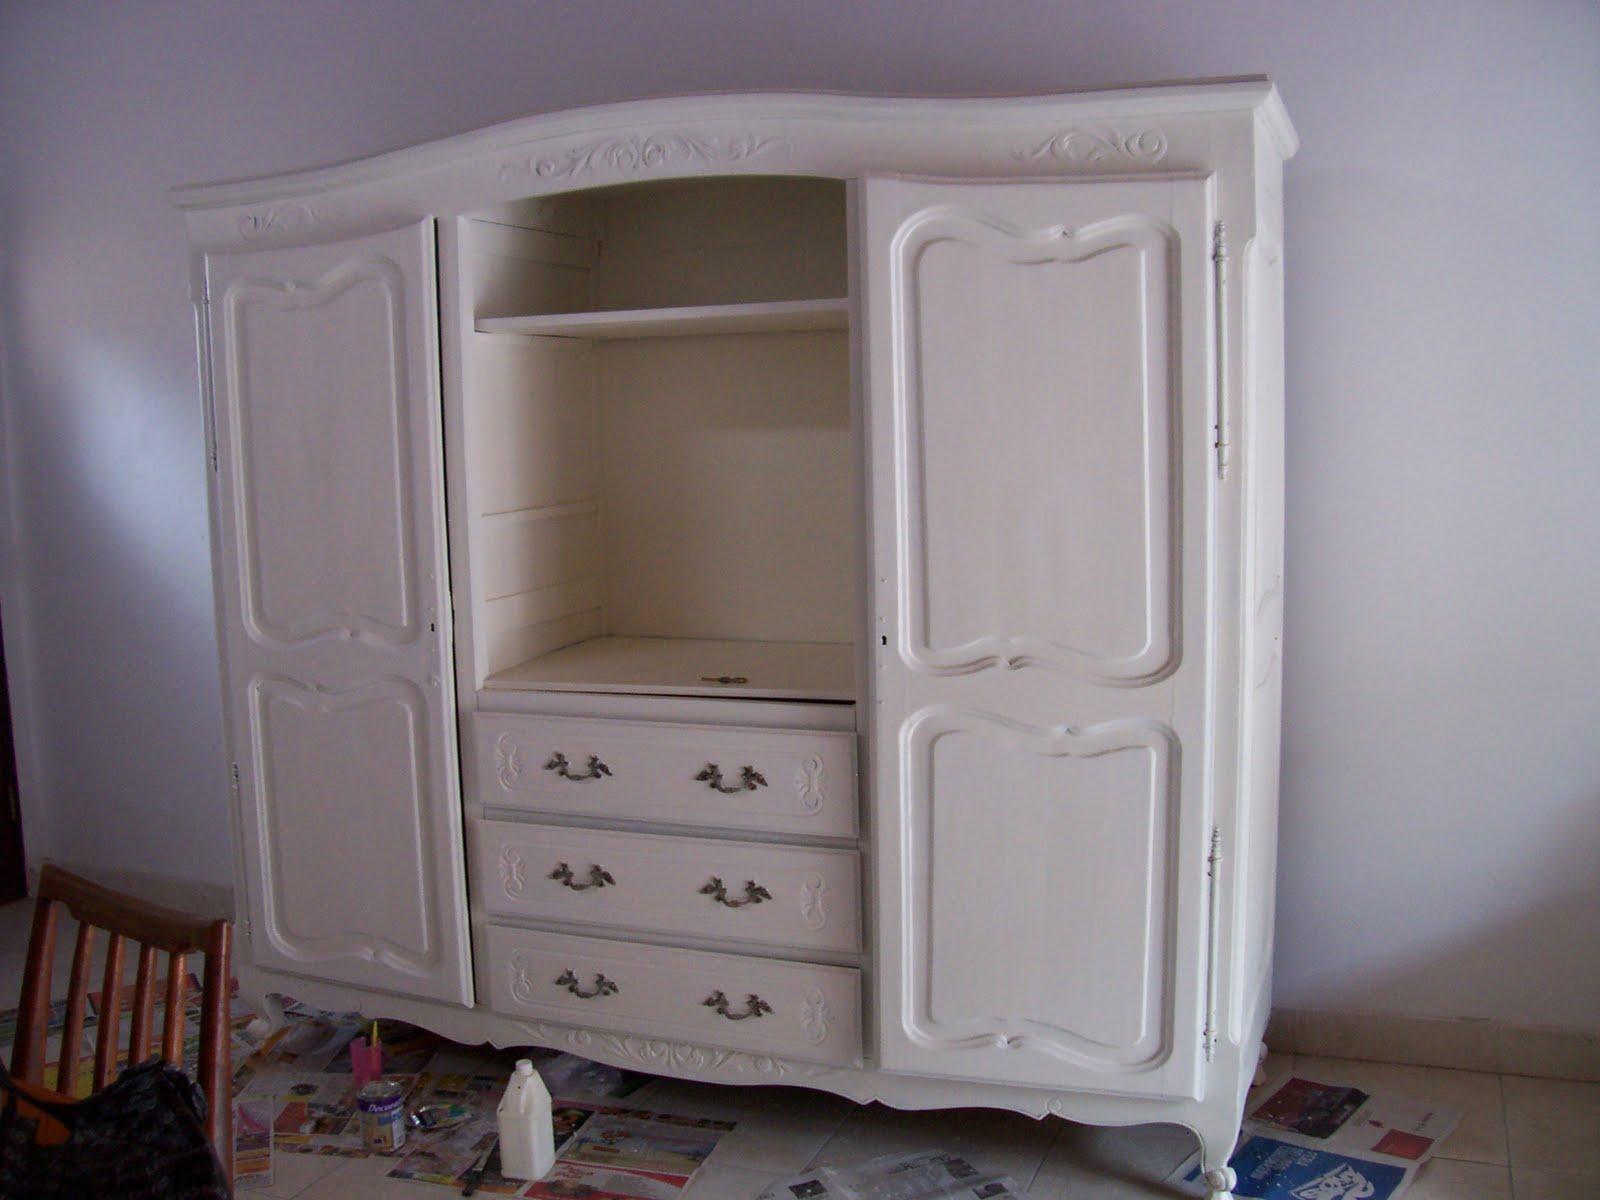 Bohemio y romantico mueble antiguo for Herrajes muebles antiguos